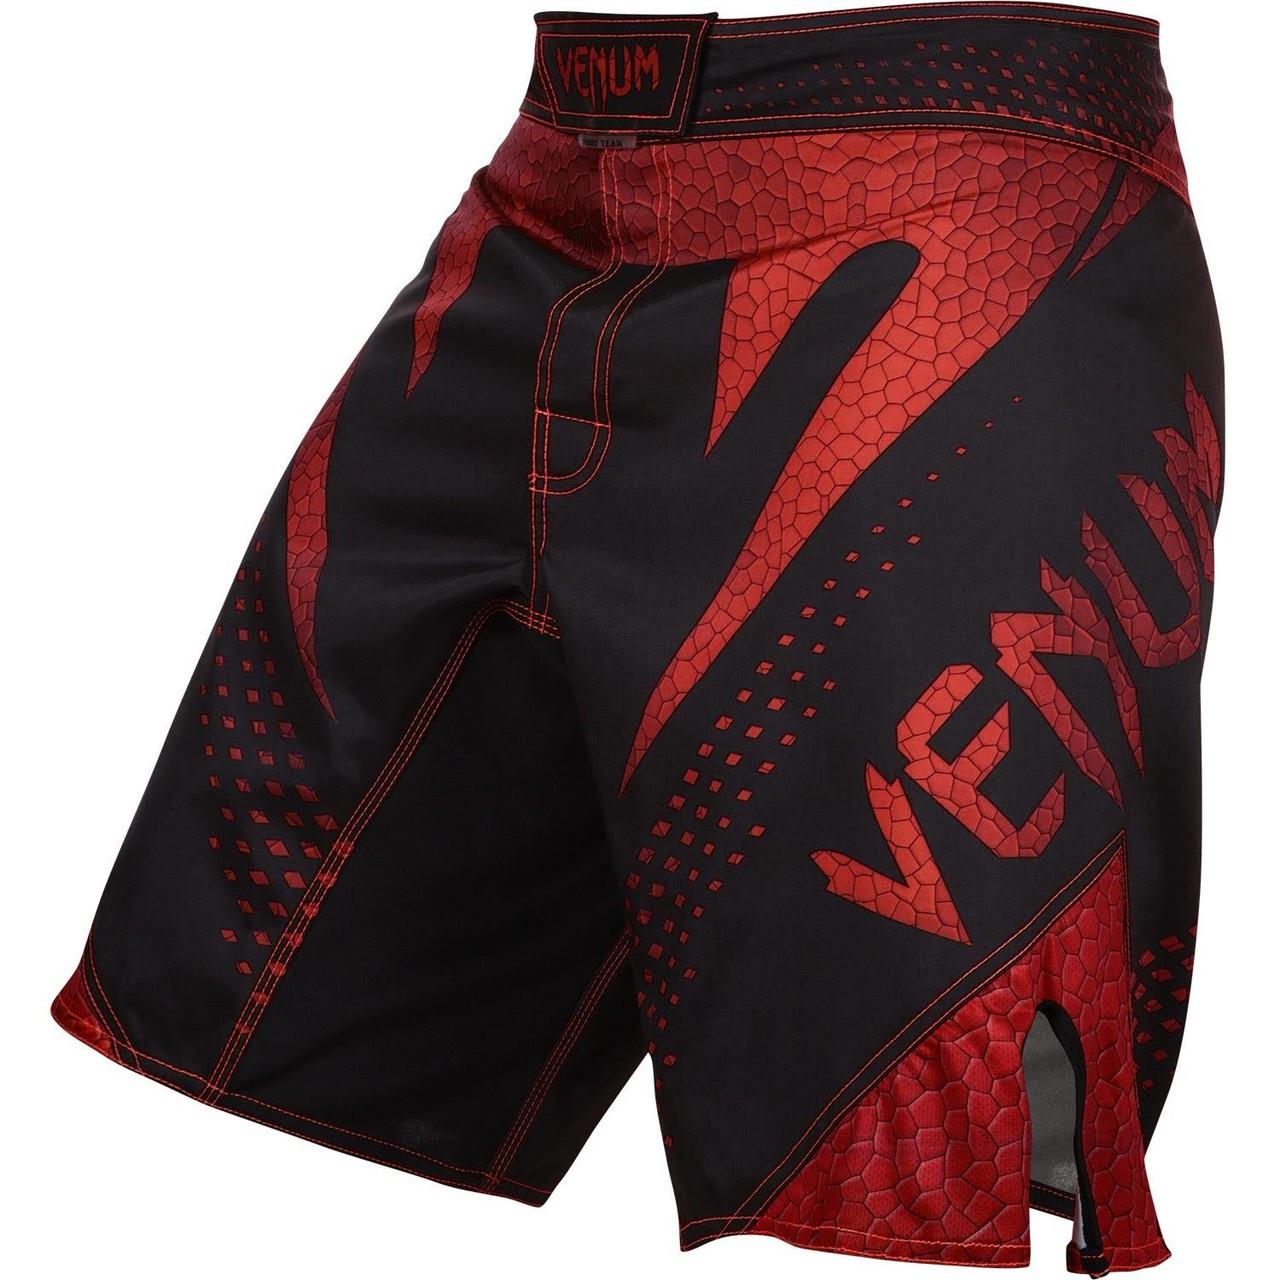 Venum Hurricane Fightshorts Amazonia Red MMA Shorts now available at www.thejiujitsushop.com  Top MMA and Grappling Shorts  Enjoy Free Shipping from The Jiu Jitsu Shop today!